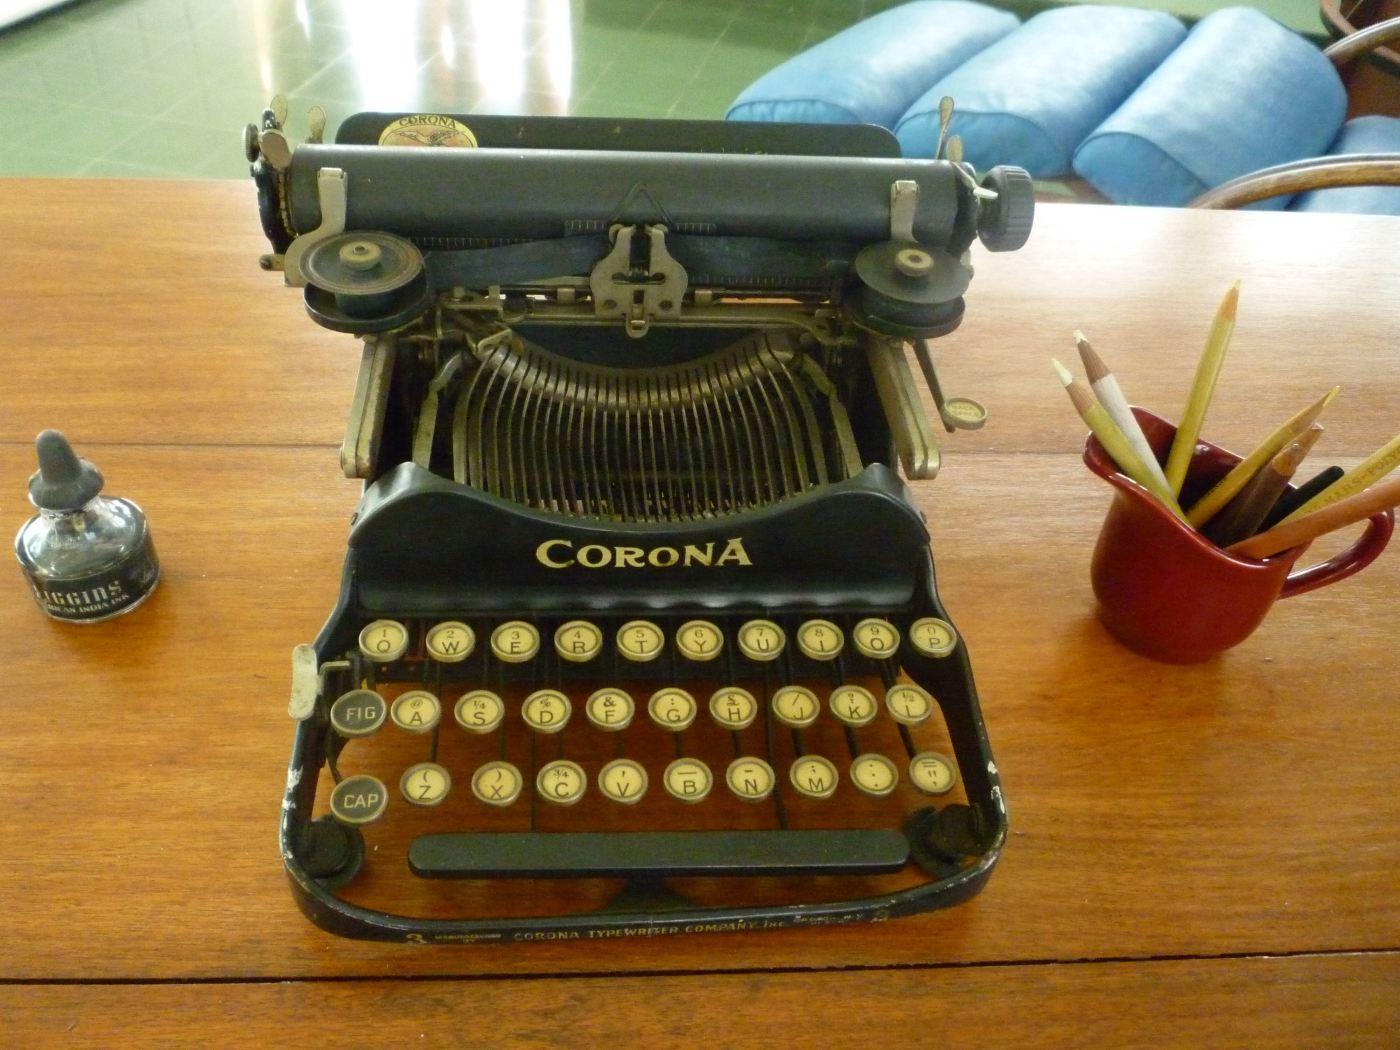 Ernest Hemingways typewriter on his desk in Havana, Cuba.